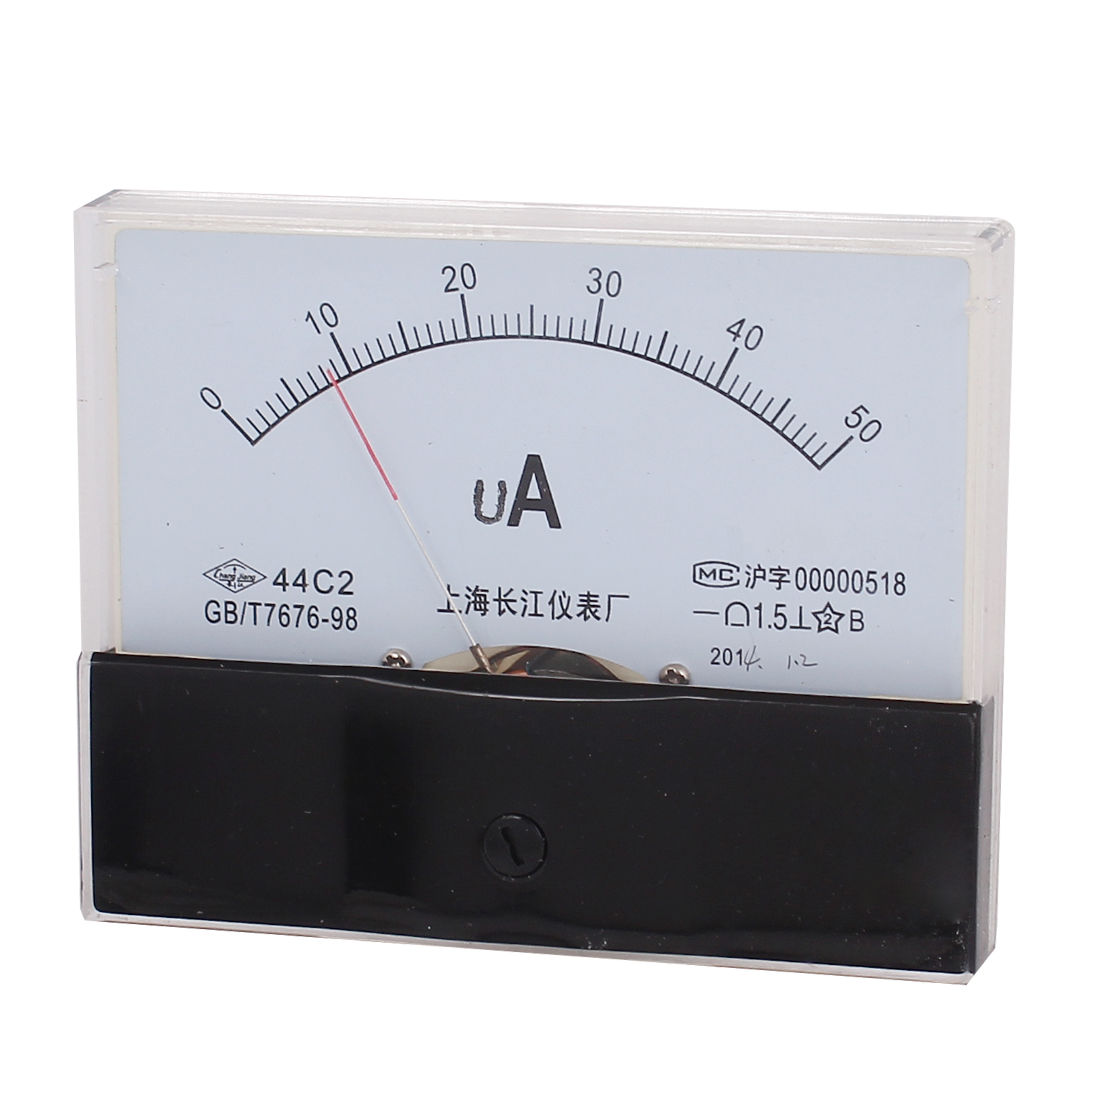 DC 0-50uA Class 1.5 Accuracy Analog Amperemeter Panel Meter Gauge 44C2